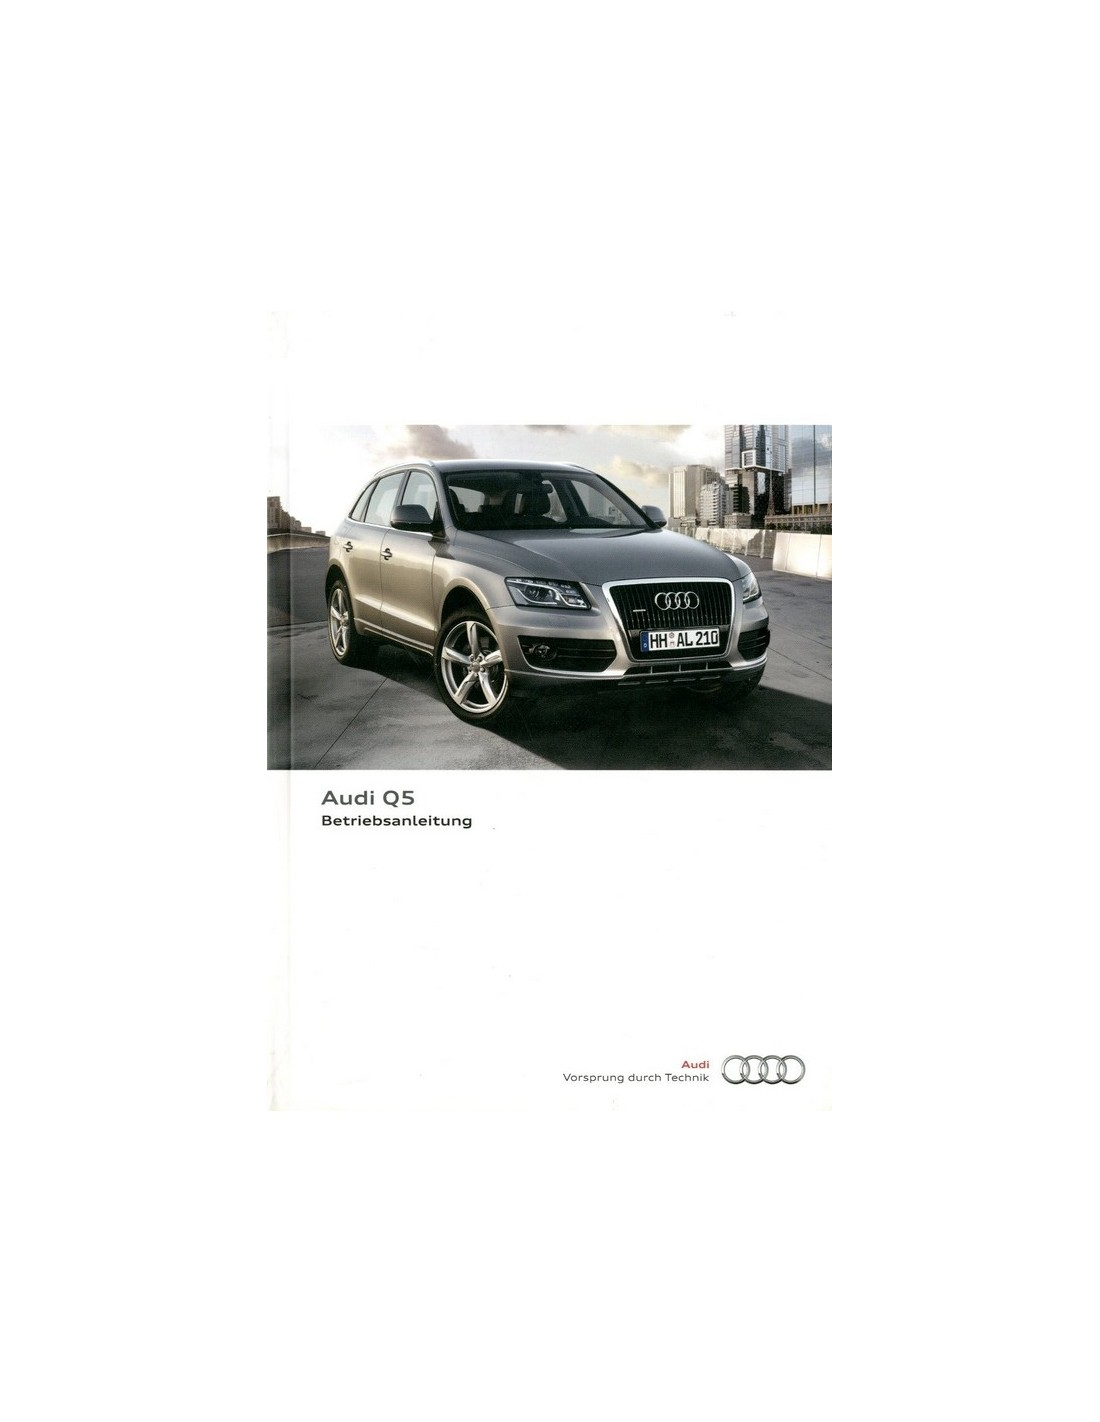 2010 audi q5 owner s manual german rh autolit eu audi q5 owners manual 2018 audi q5 owners manual 2018